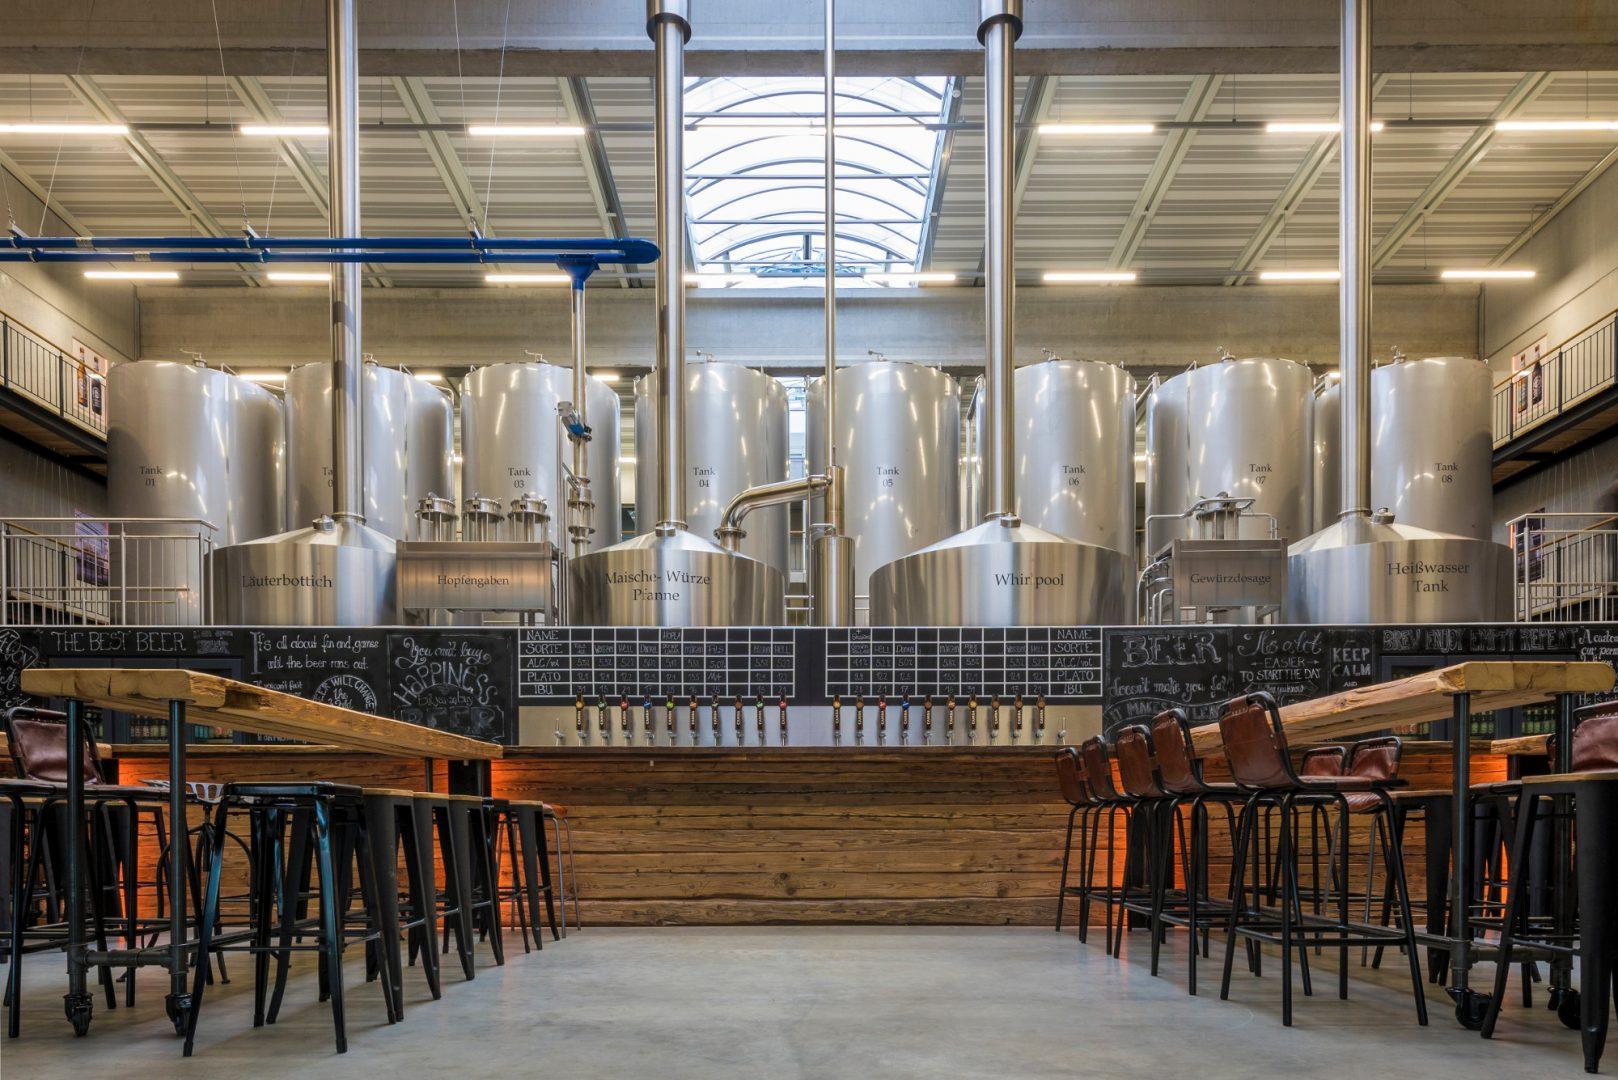 Camba Bavaria: Craft-beer pioneer